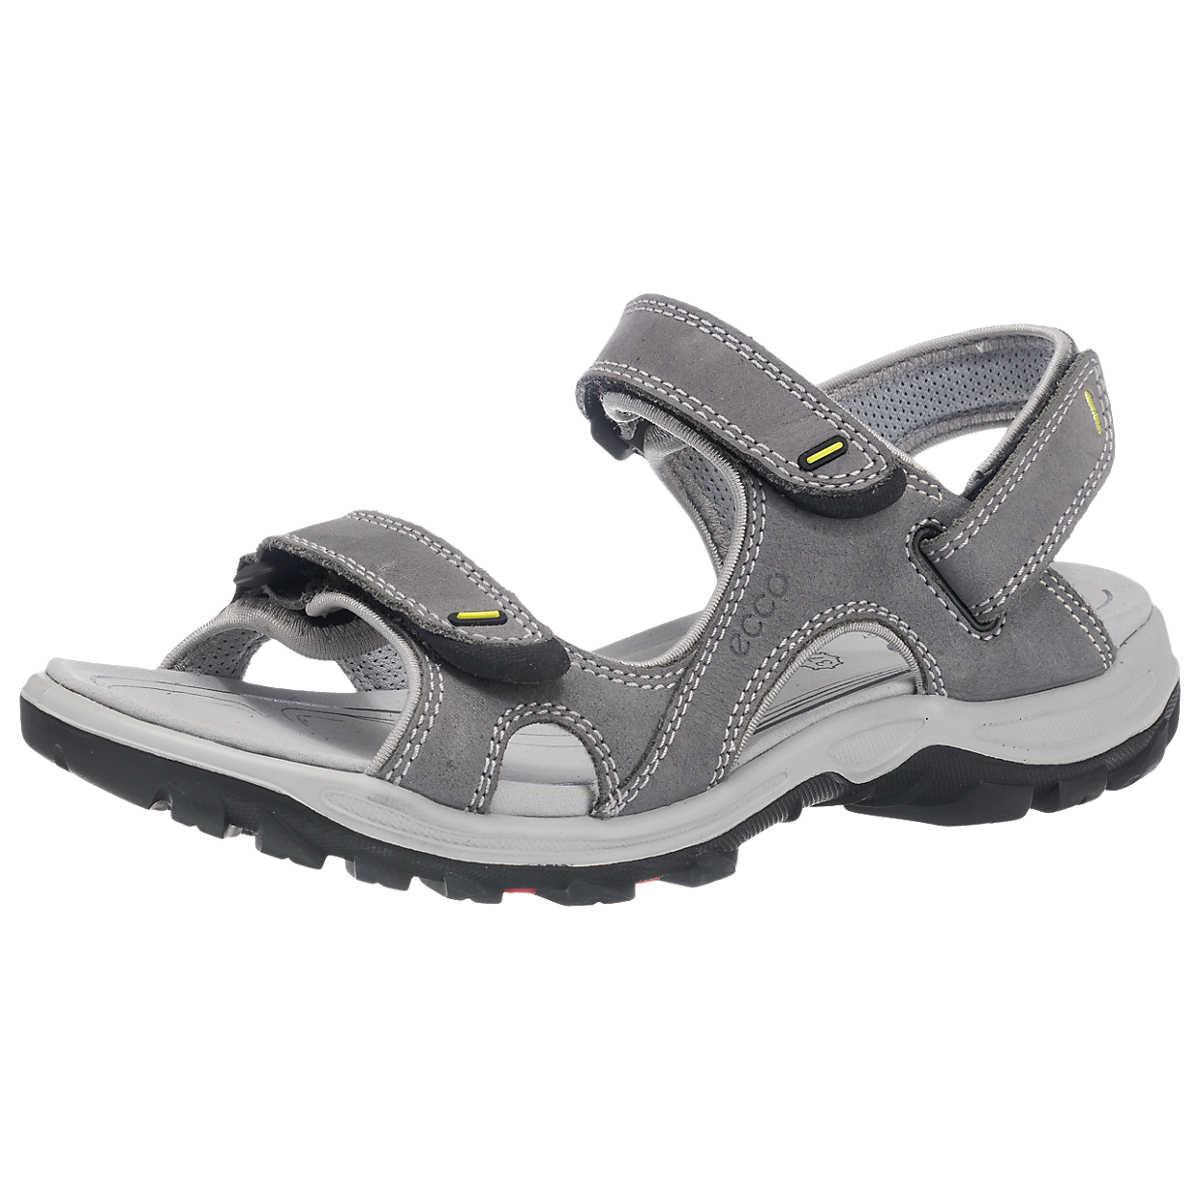 ecco Offroad Sandalen grau - ecco - Sandalen - Schuhe - mirapodo.de